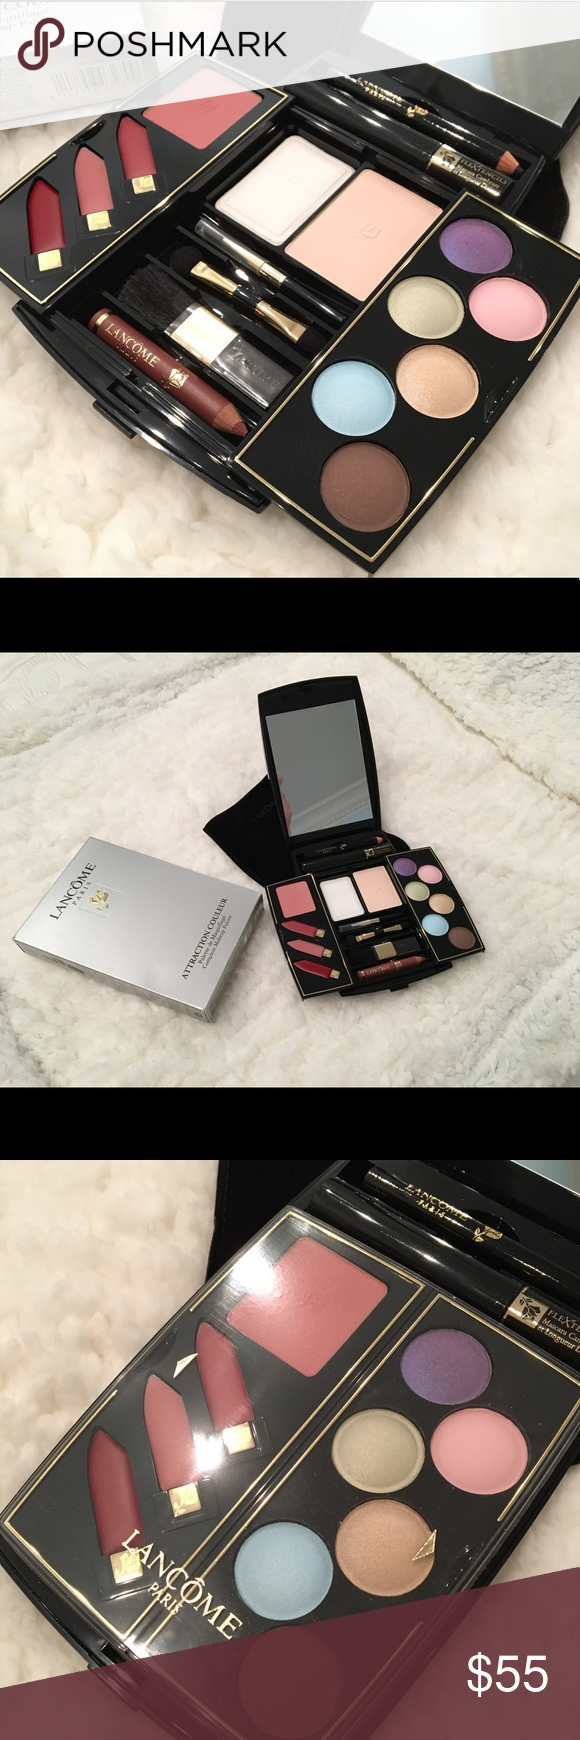 Lancôme Absolue Seduction Complete Make Up Palette [Brand